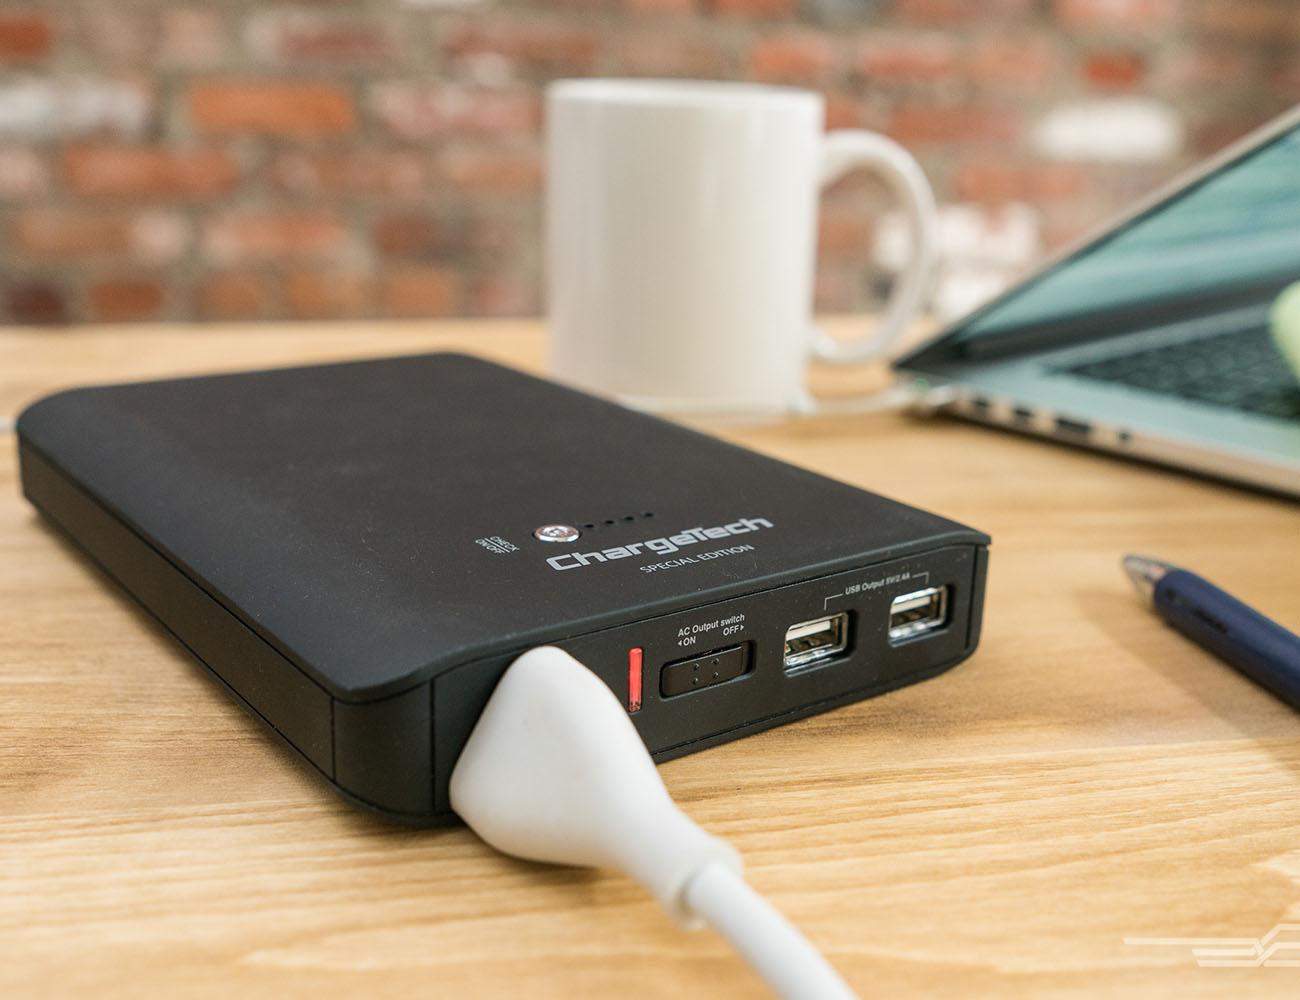 ChargeTech Universal Portable Power Bank